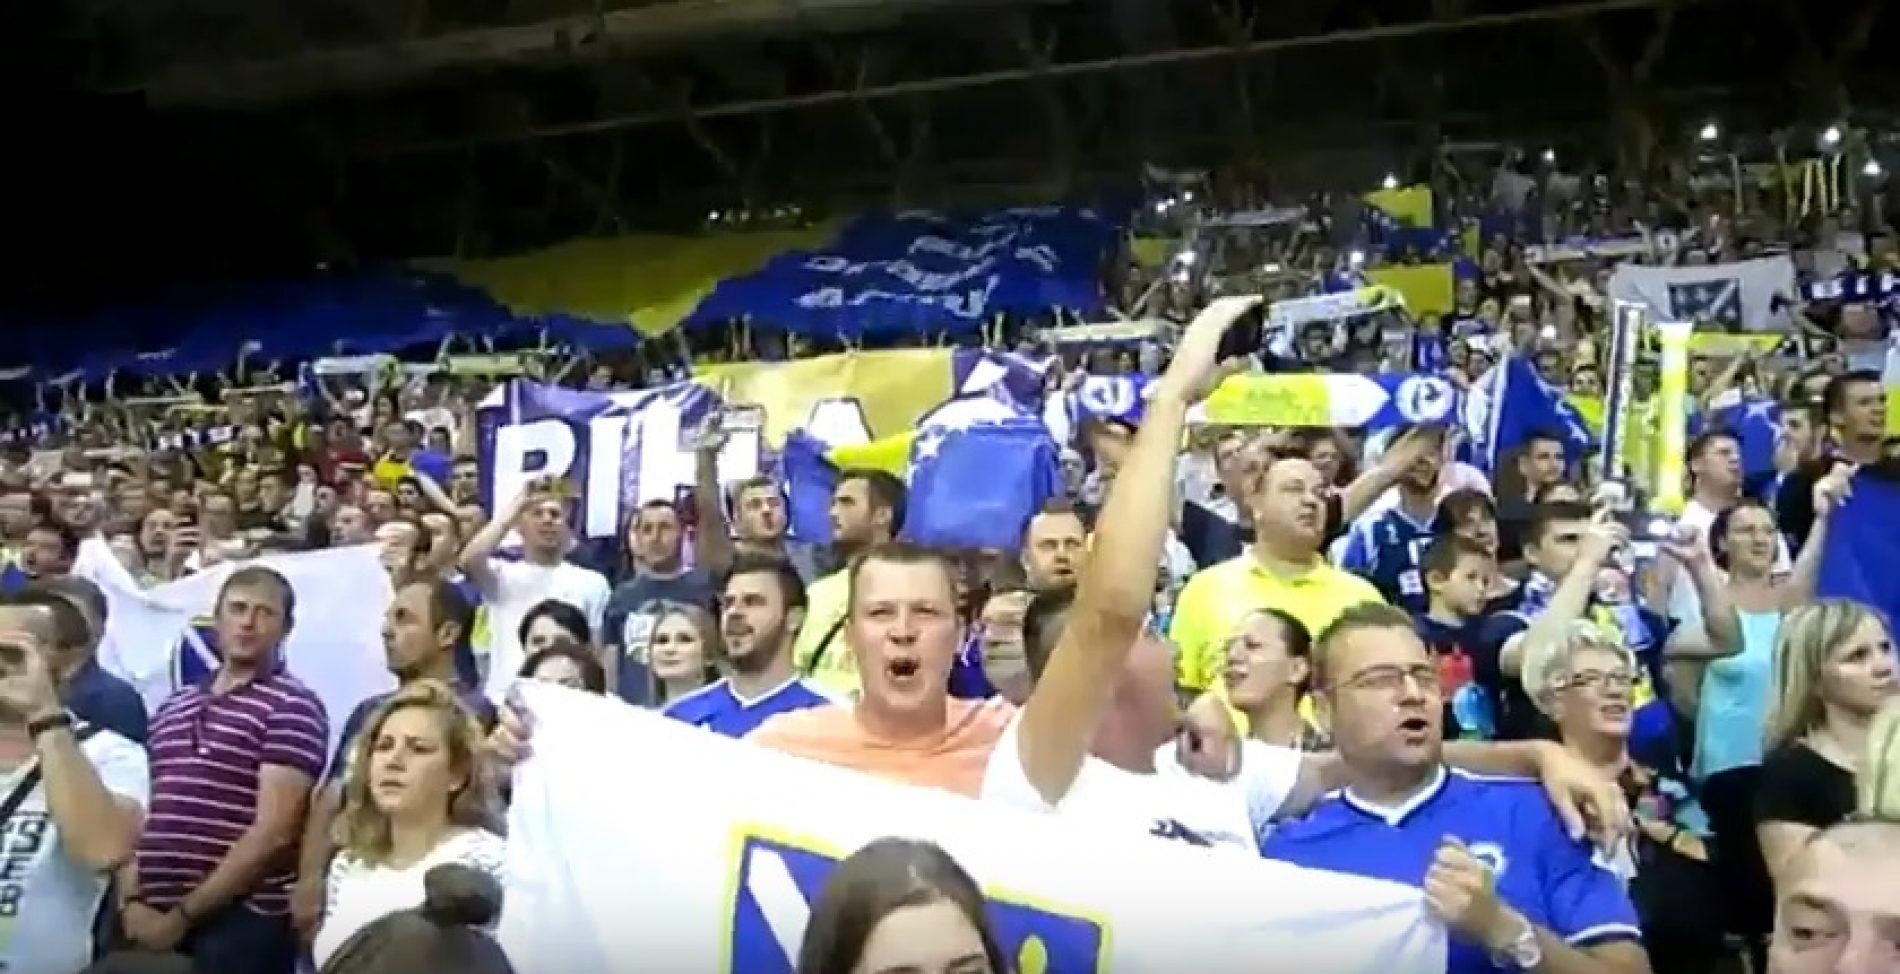 Ulaznice za košarkaški meč Bosna i Hercegovina – Grčka sutra u prodaji u Tuzli